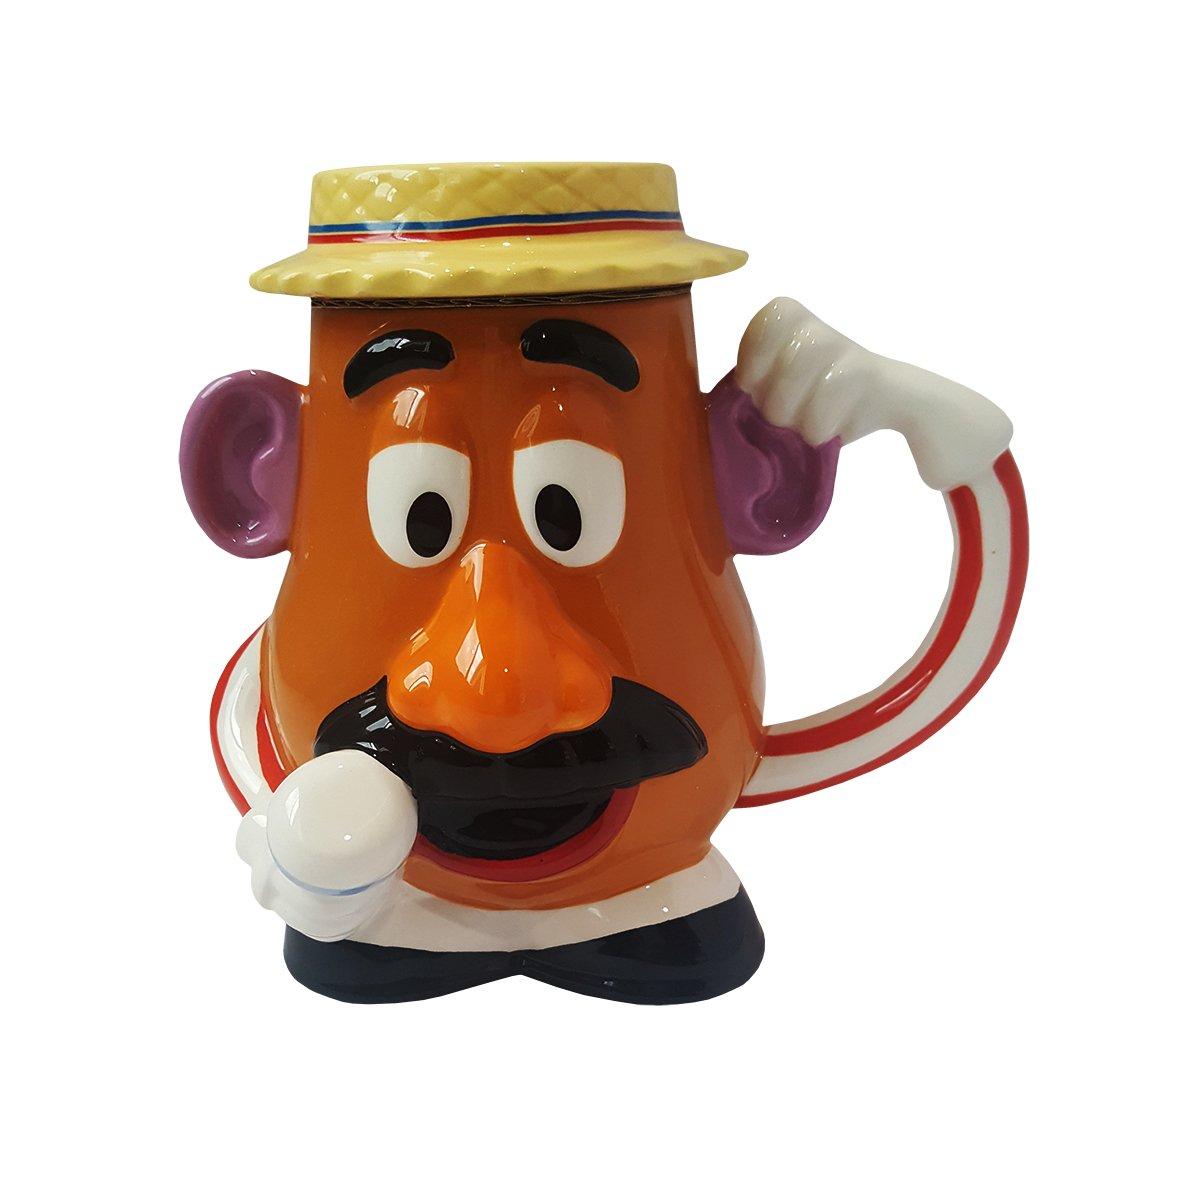 Mr Potato Head Mug with Lid